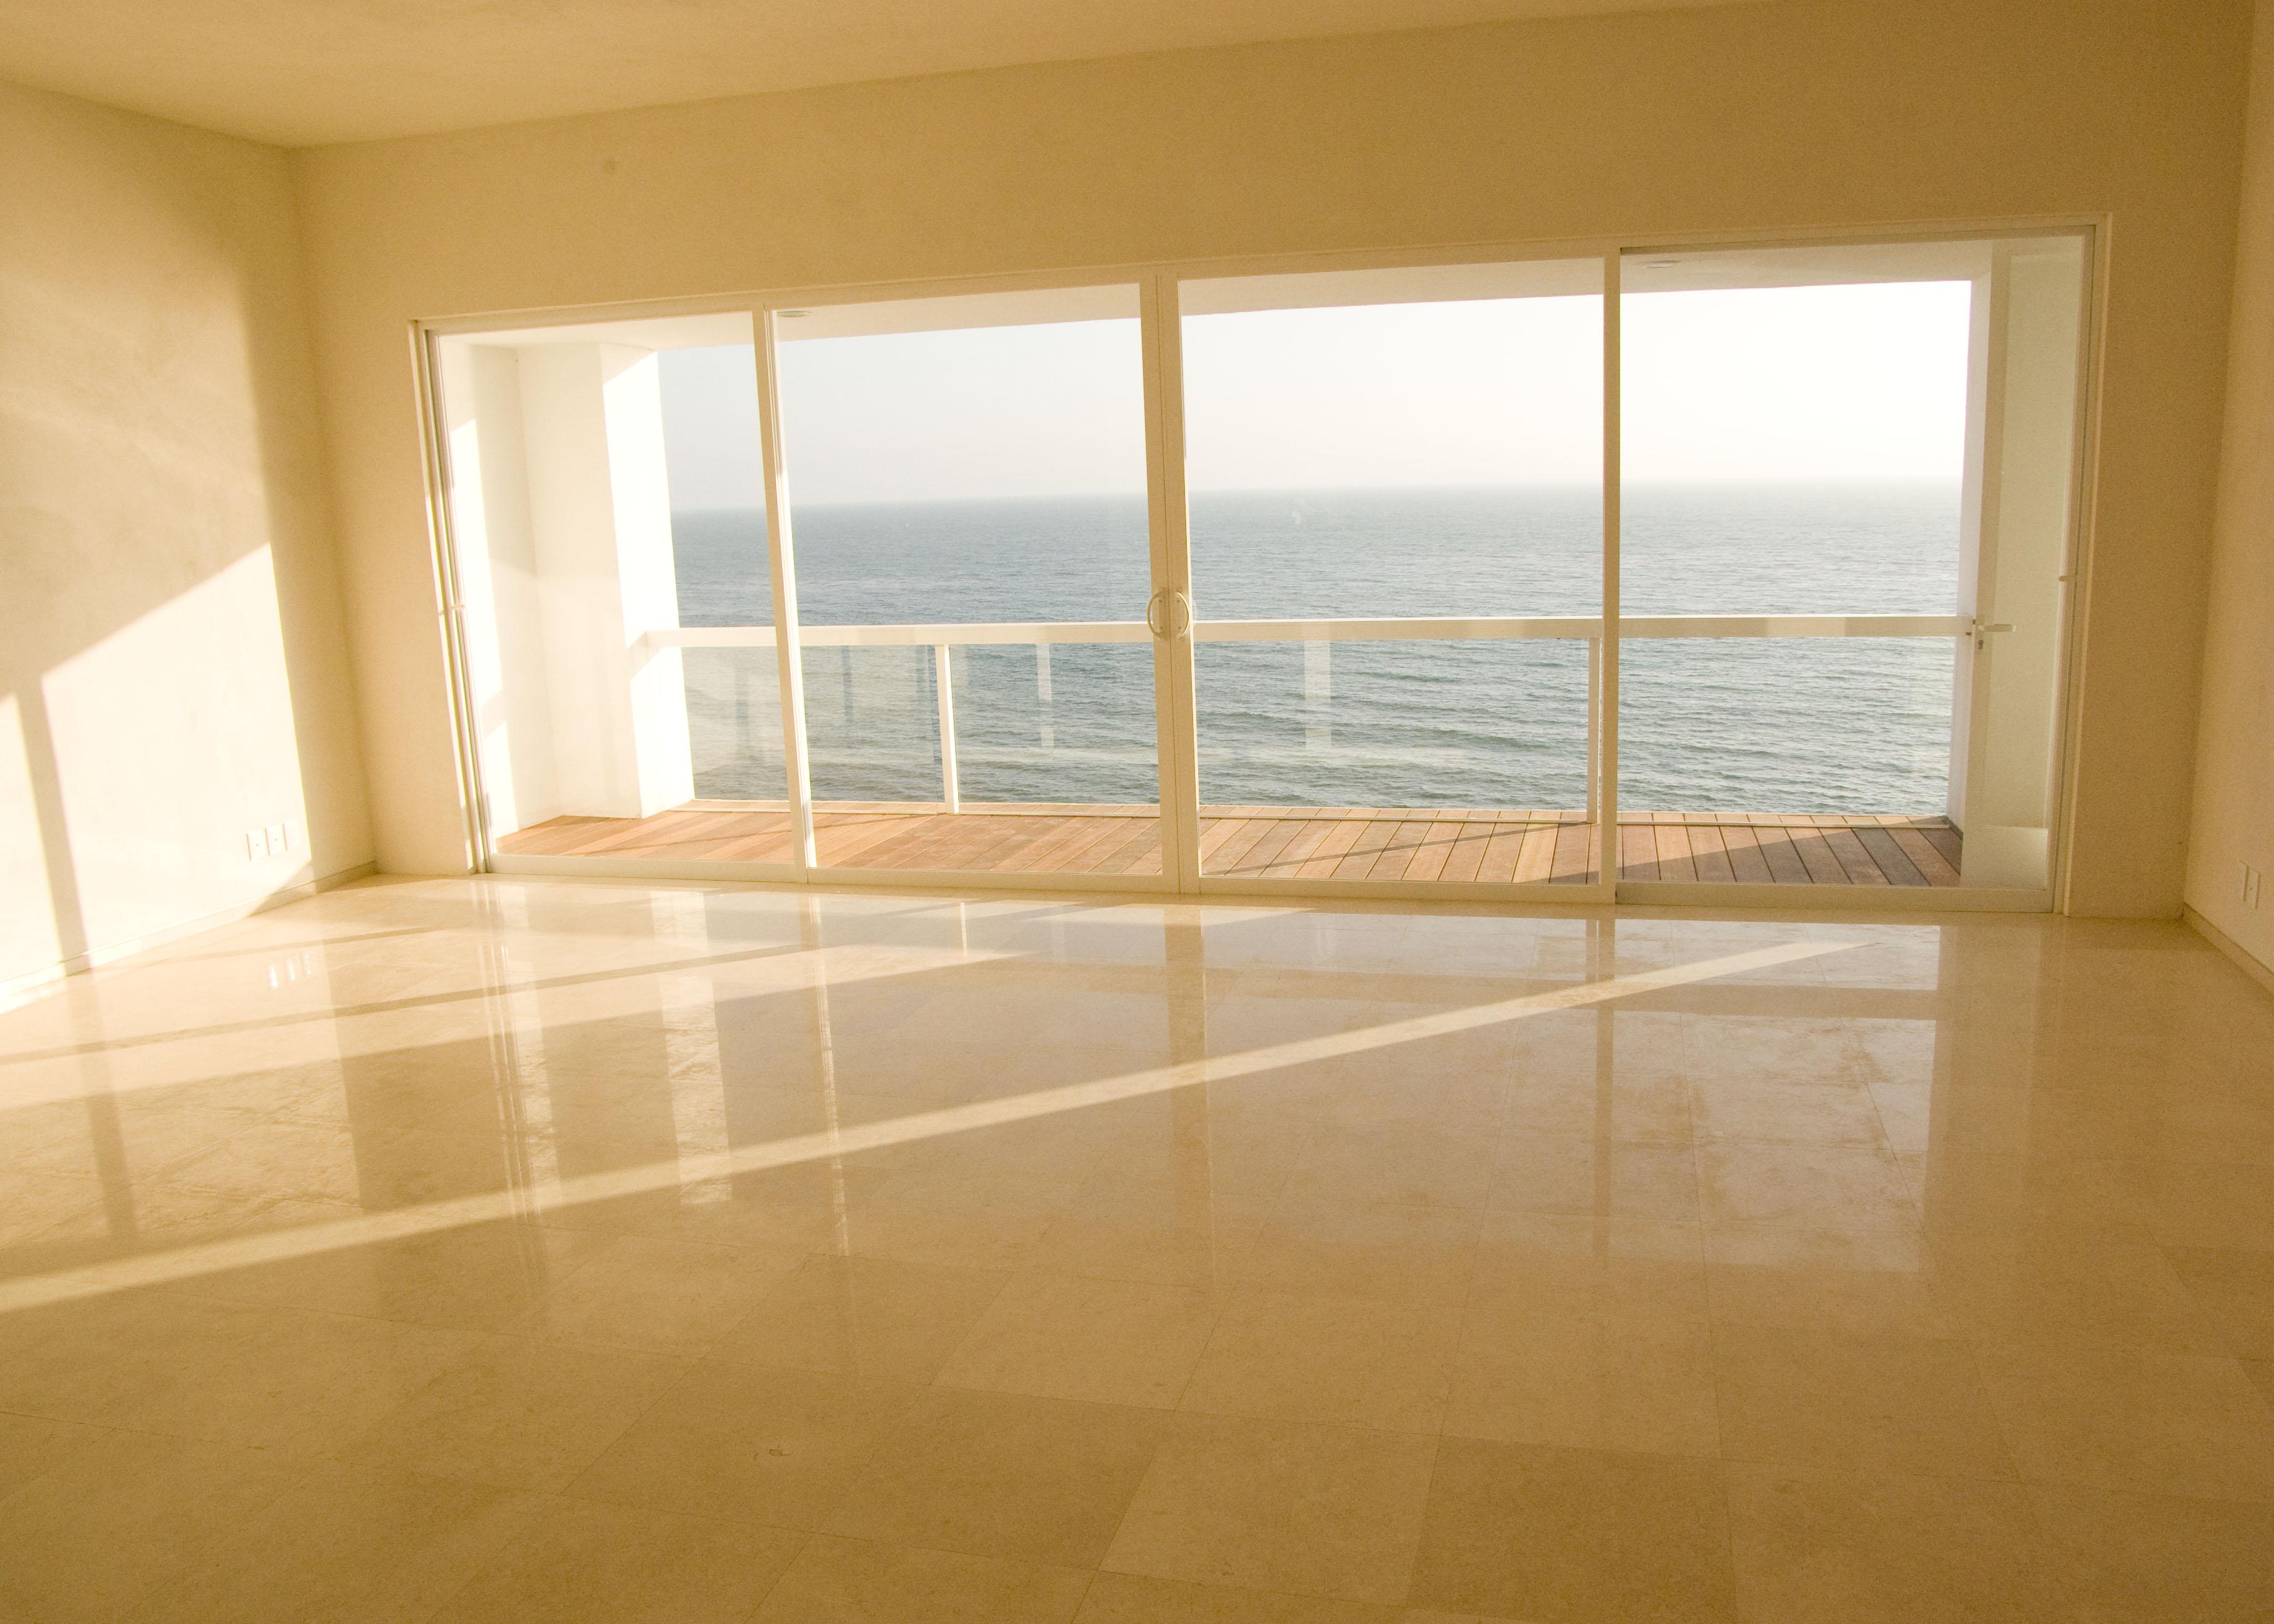 the big empty room | photo page - everystockphoto